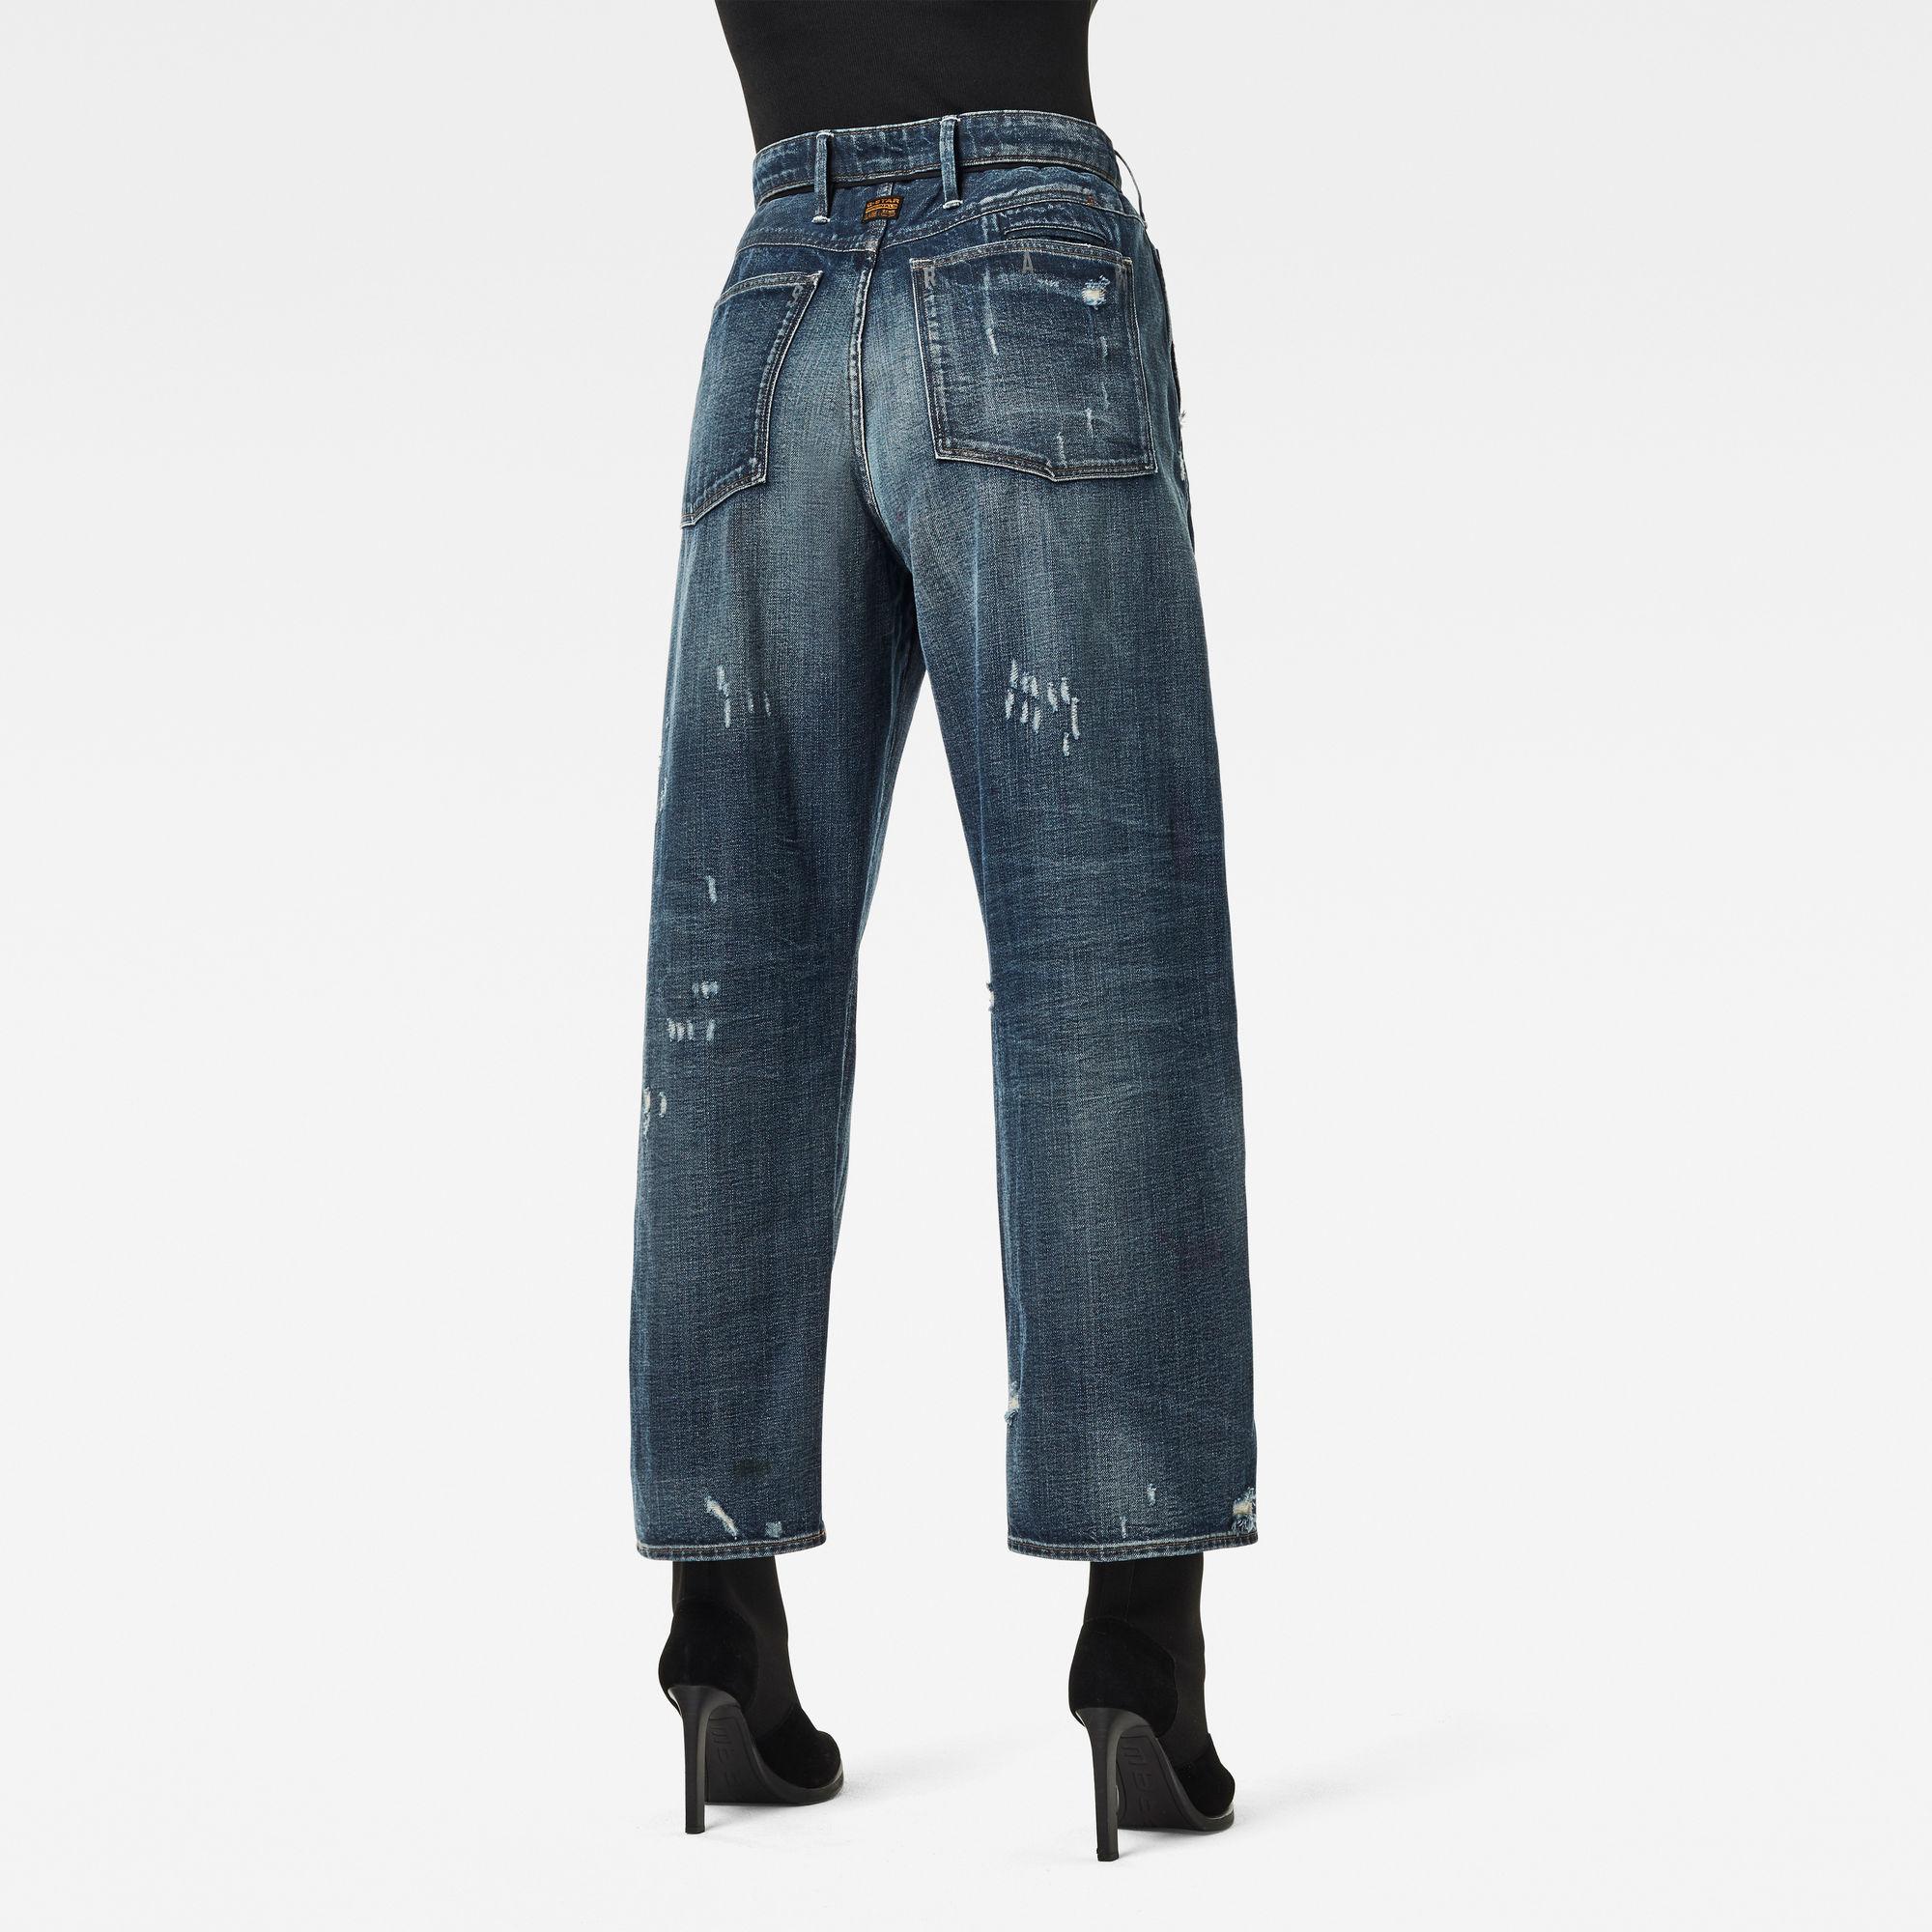 G-Star RAW Dames Lintell High Dad Jeans Blauw